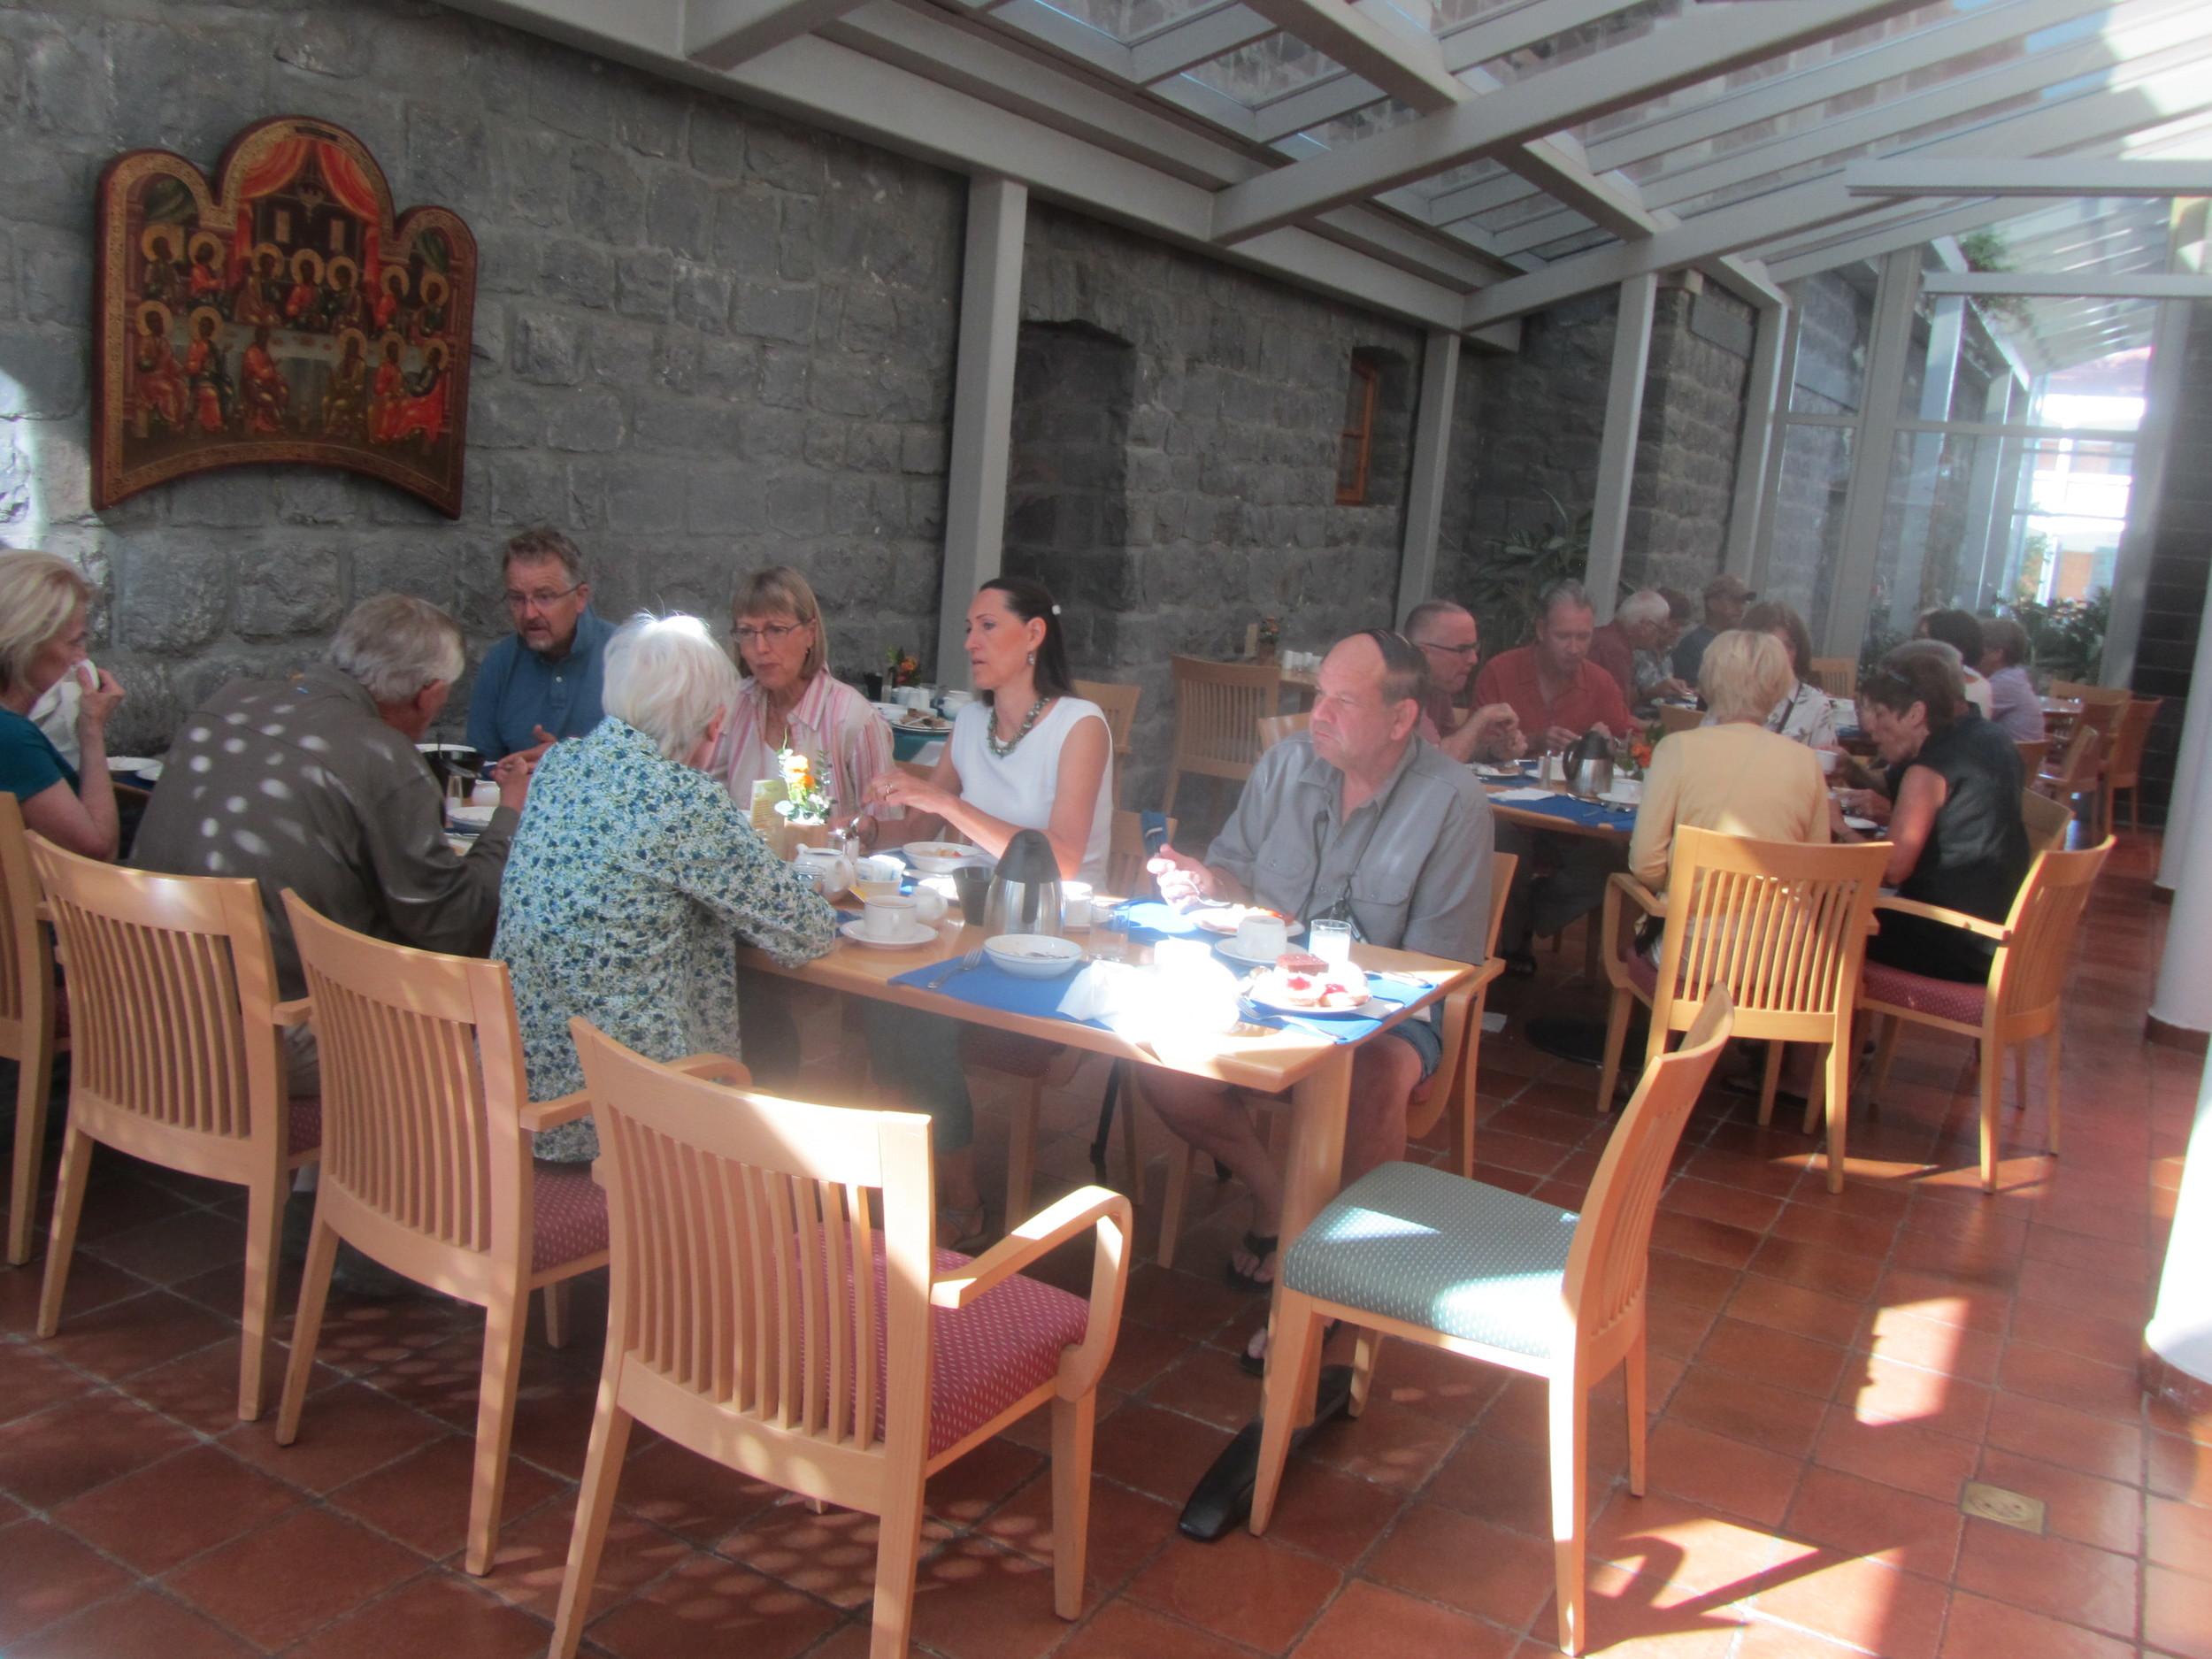 Breakfast in the Lovely Dining Room of Tabgha Pilgerhaus